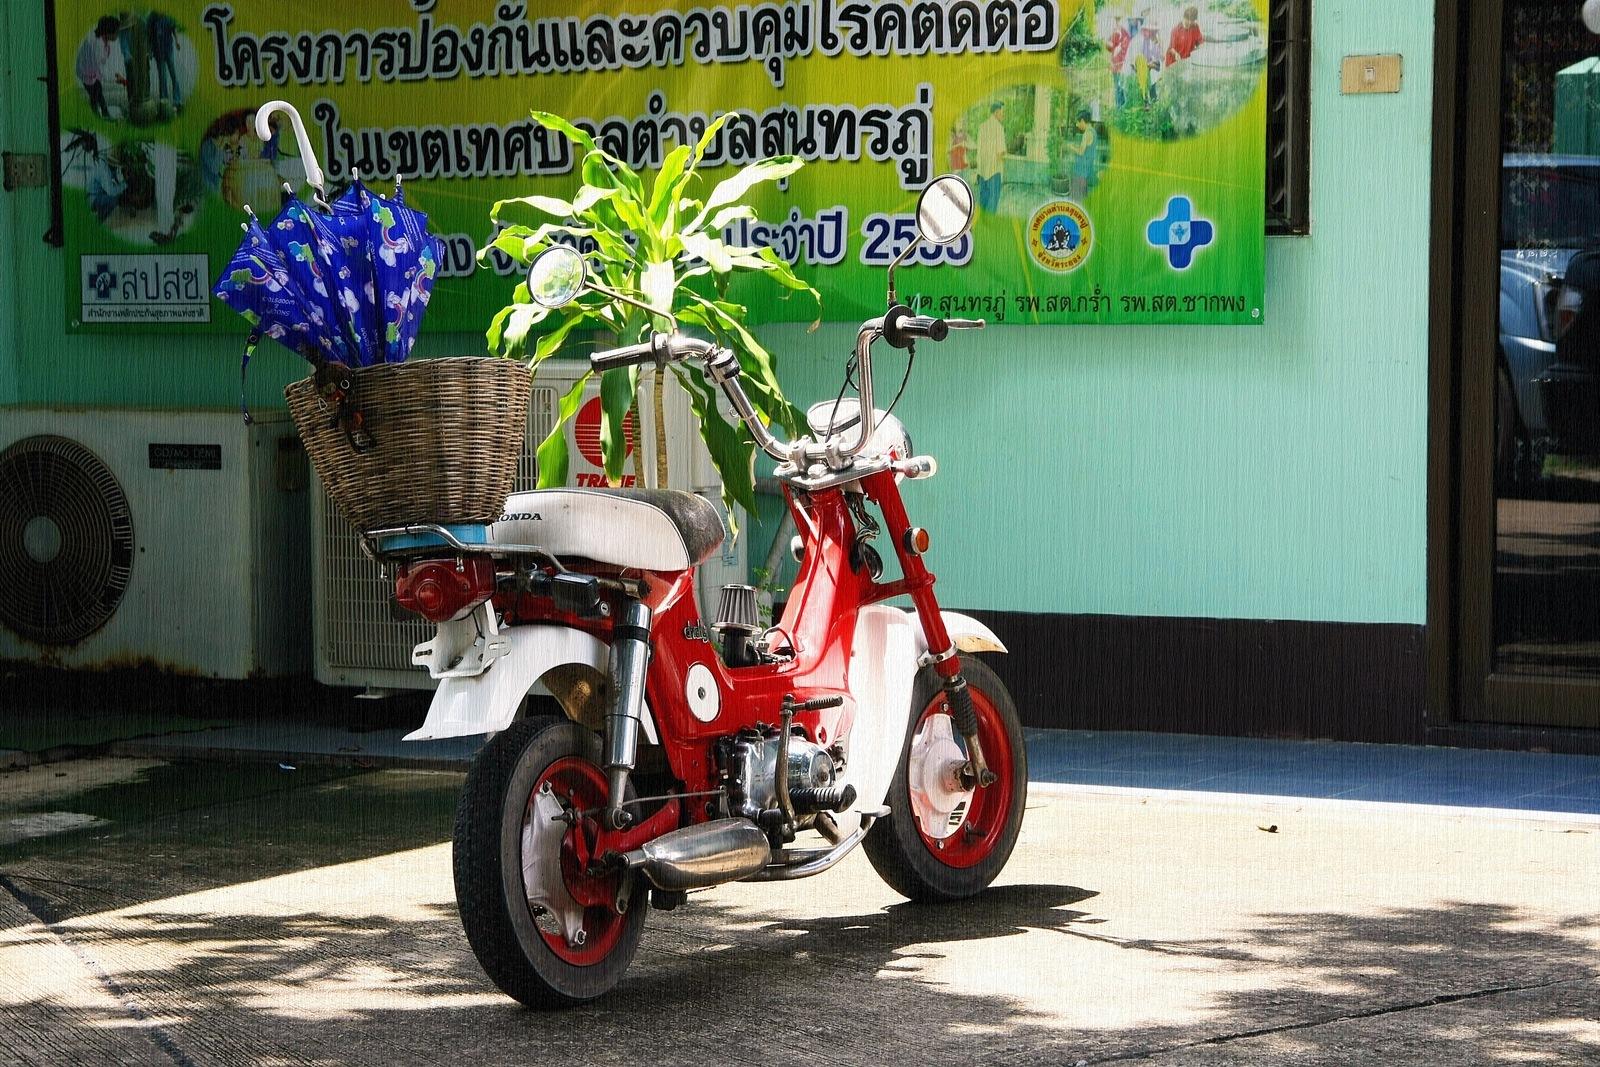 Classic Motor Bike by Toom Wai Thong